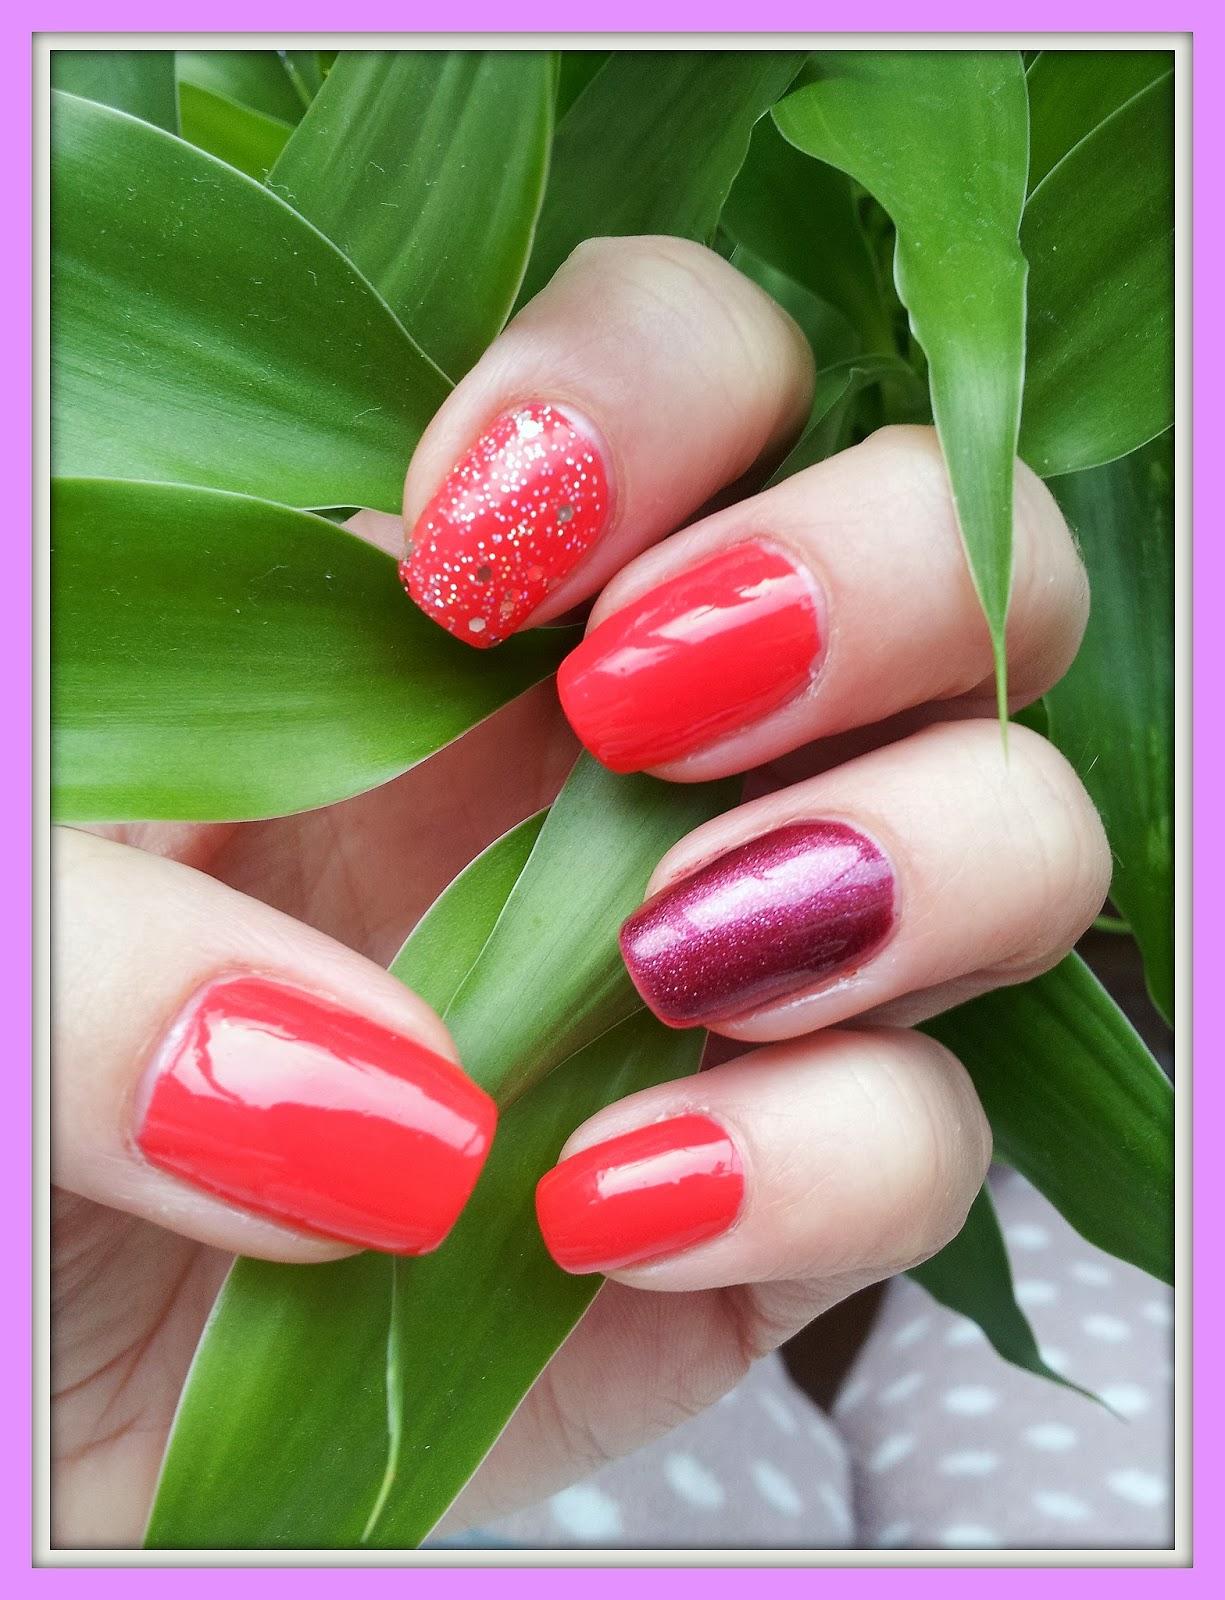 Manicure - Koral + Metaliczna Wiśnia + Brokat